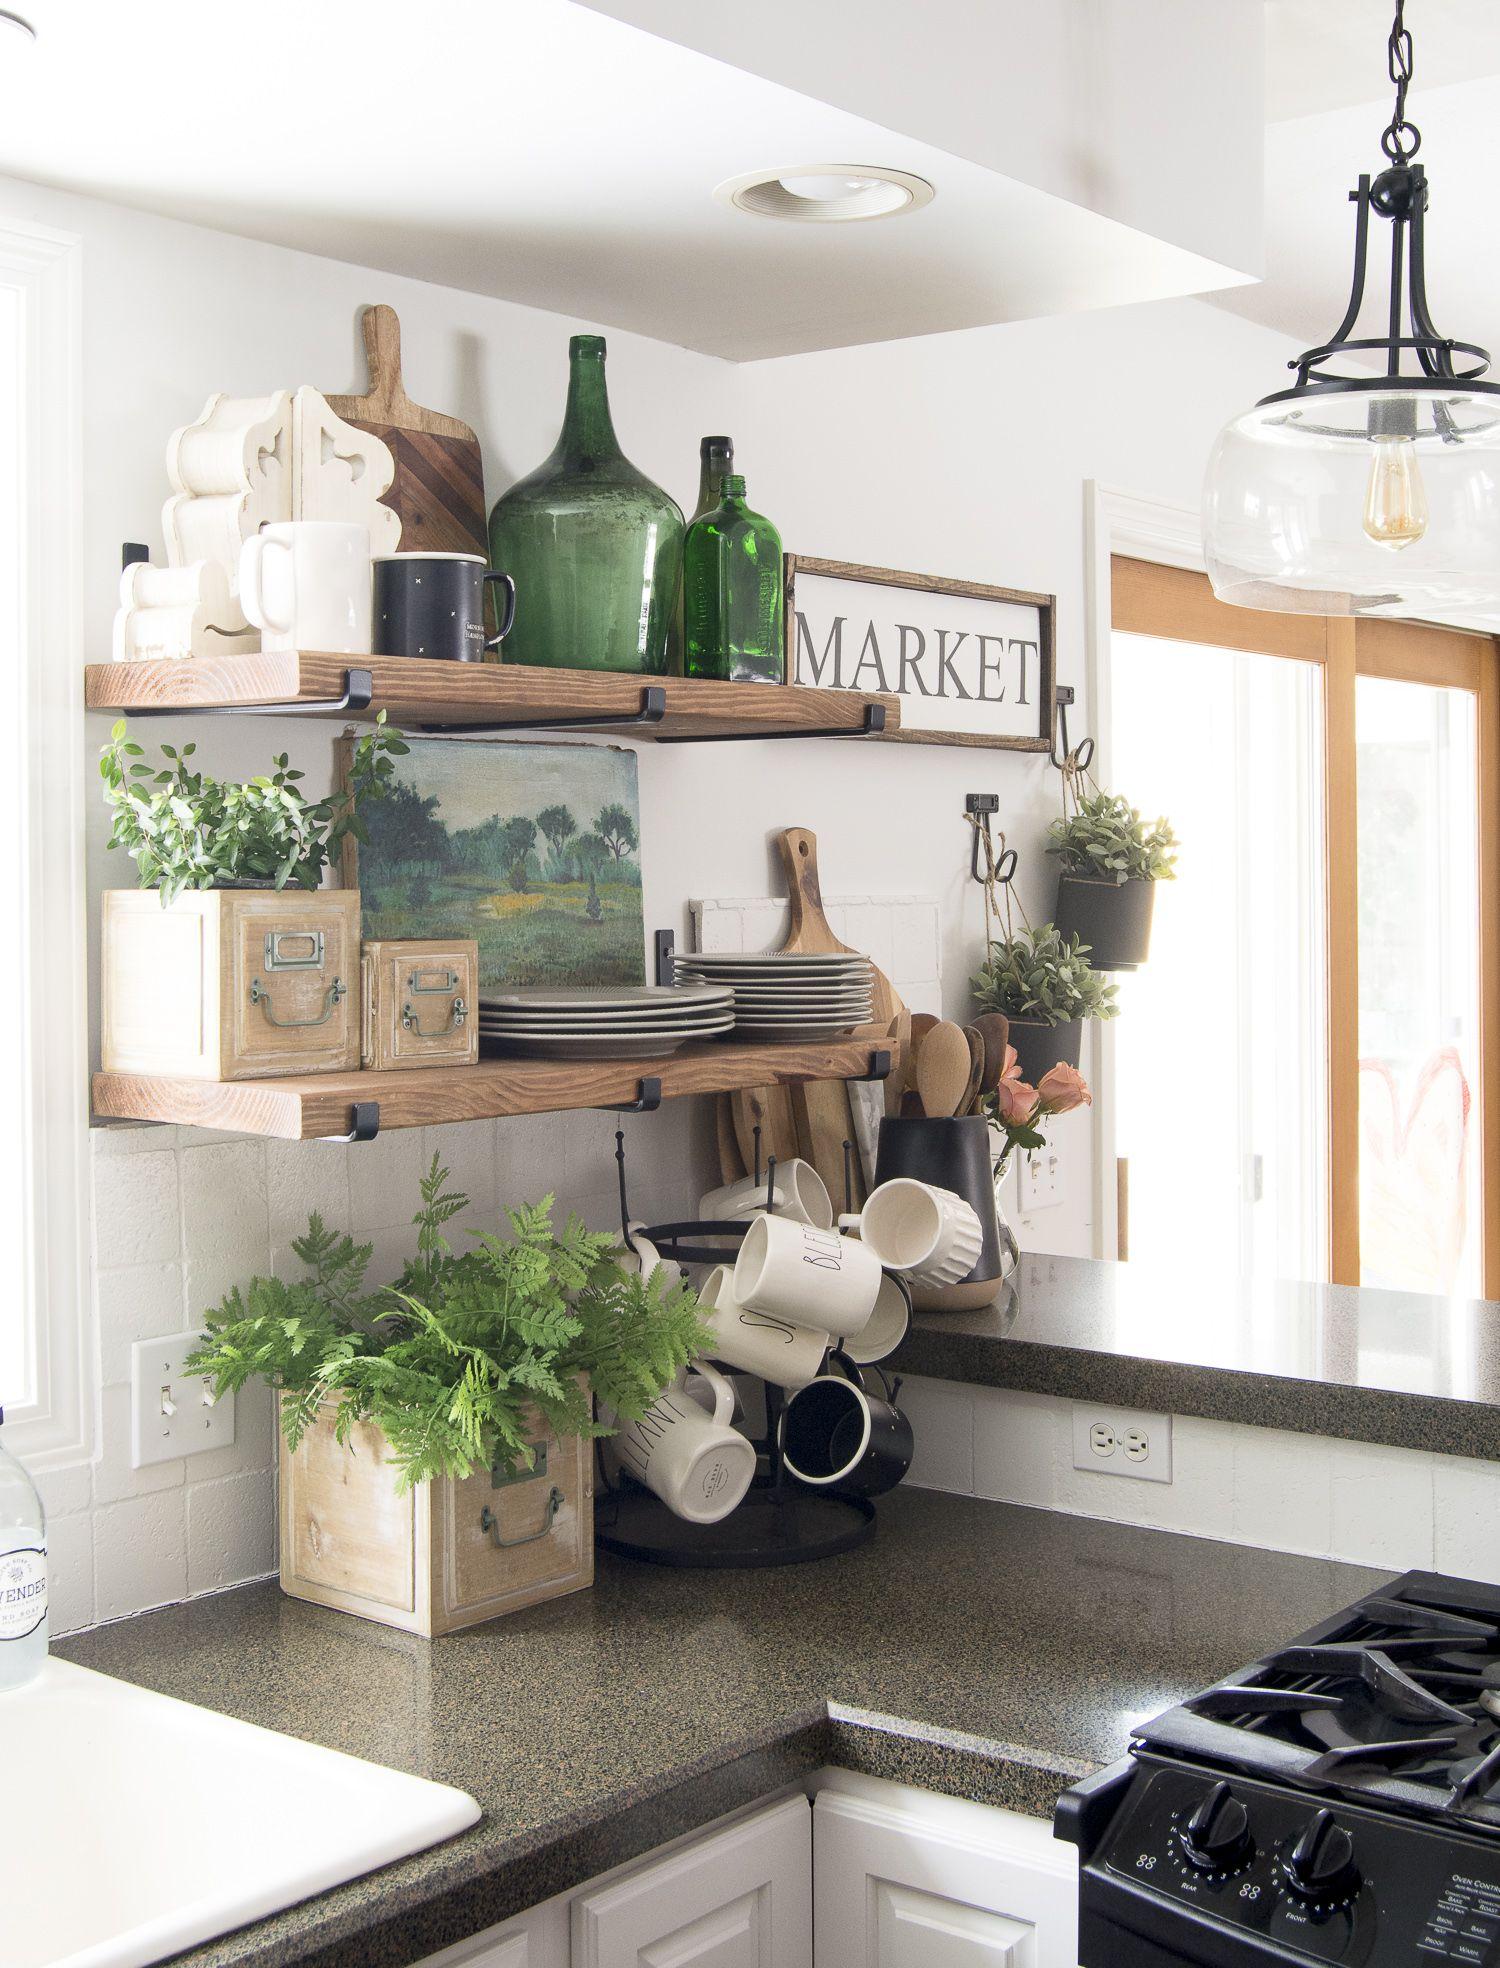 How To Decorate Kitchen Shelves Kitchen Shelf Decor Open